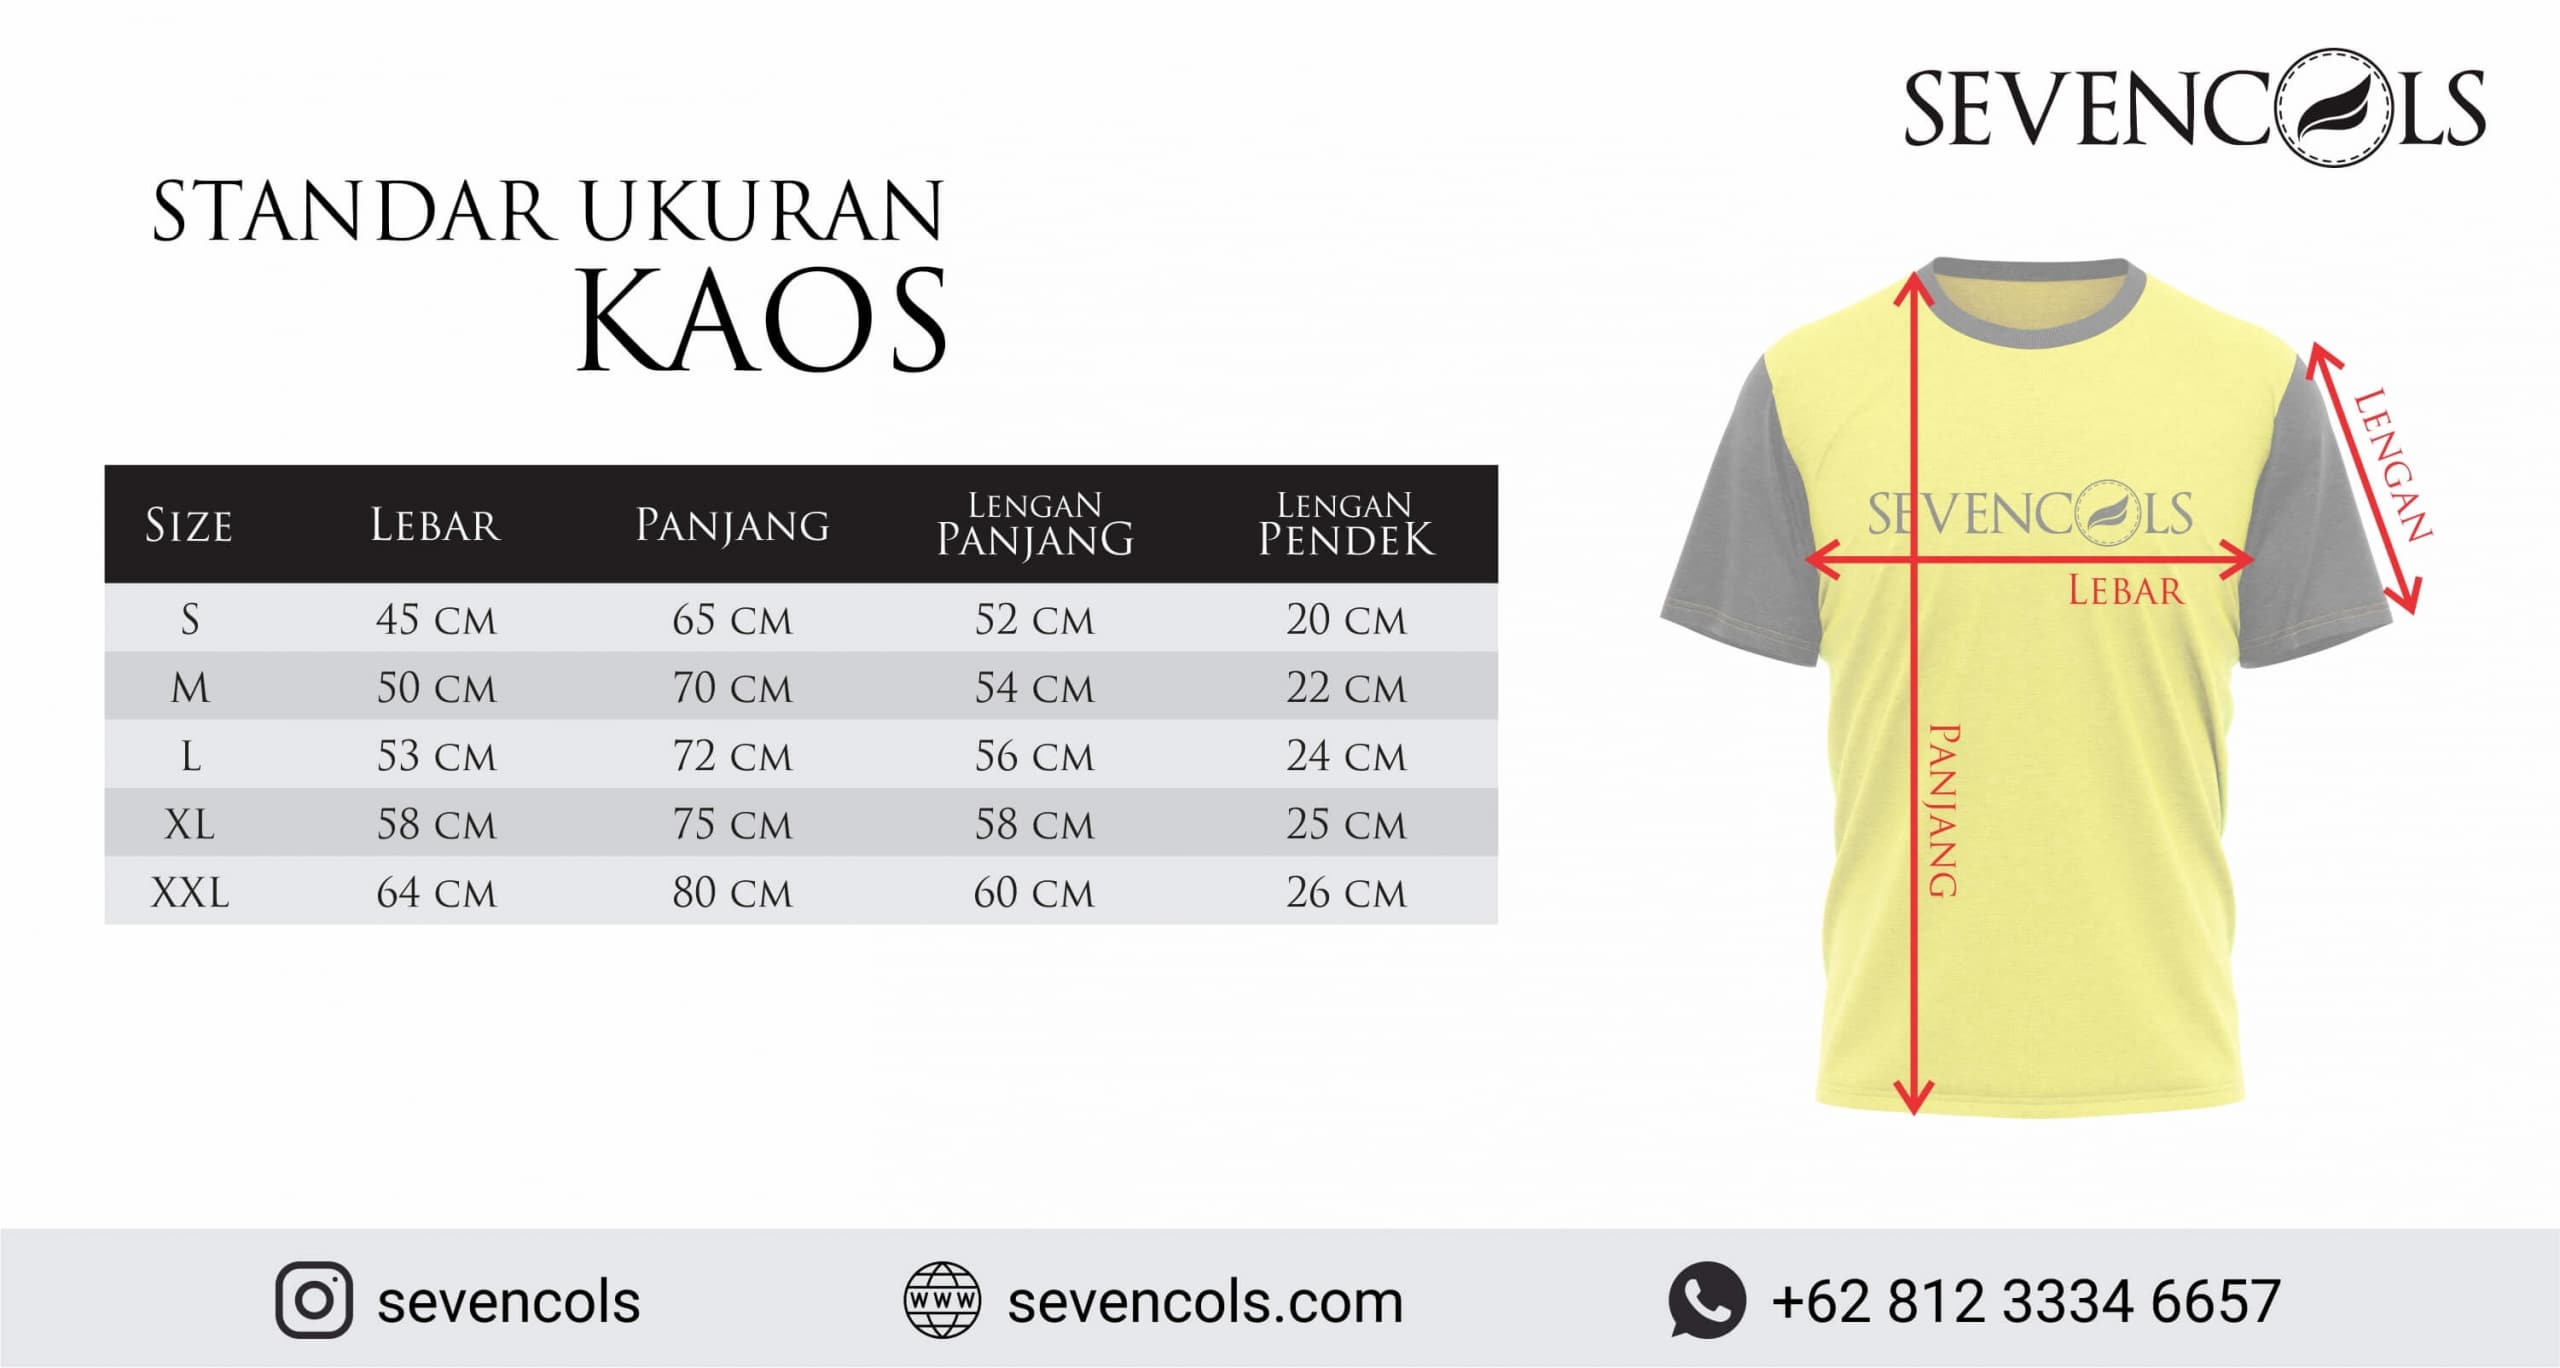 Standar Ukuran Kaos dan jersey Konveksi Malang Sevencols